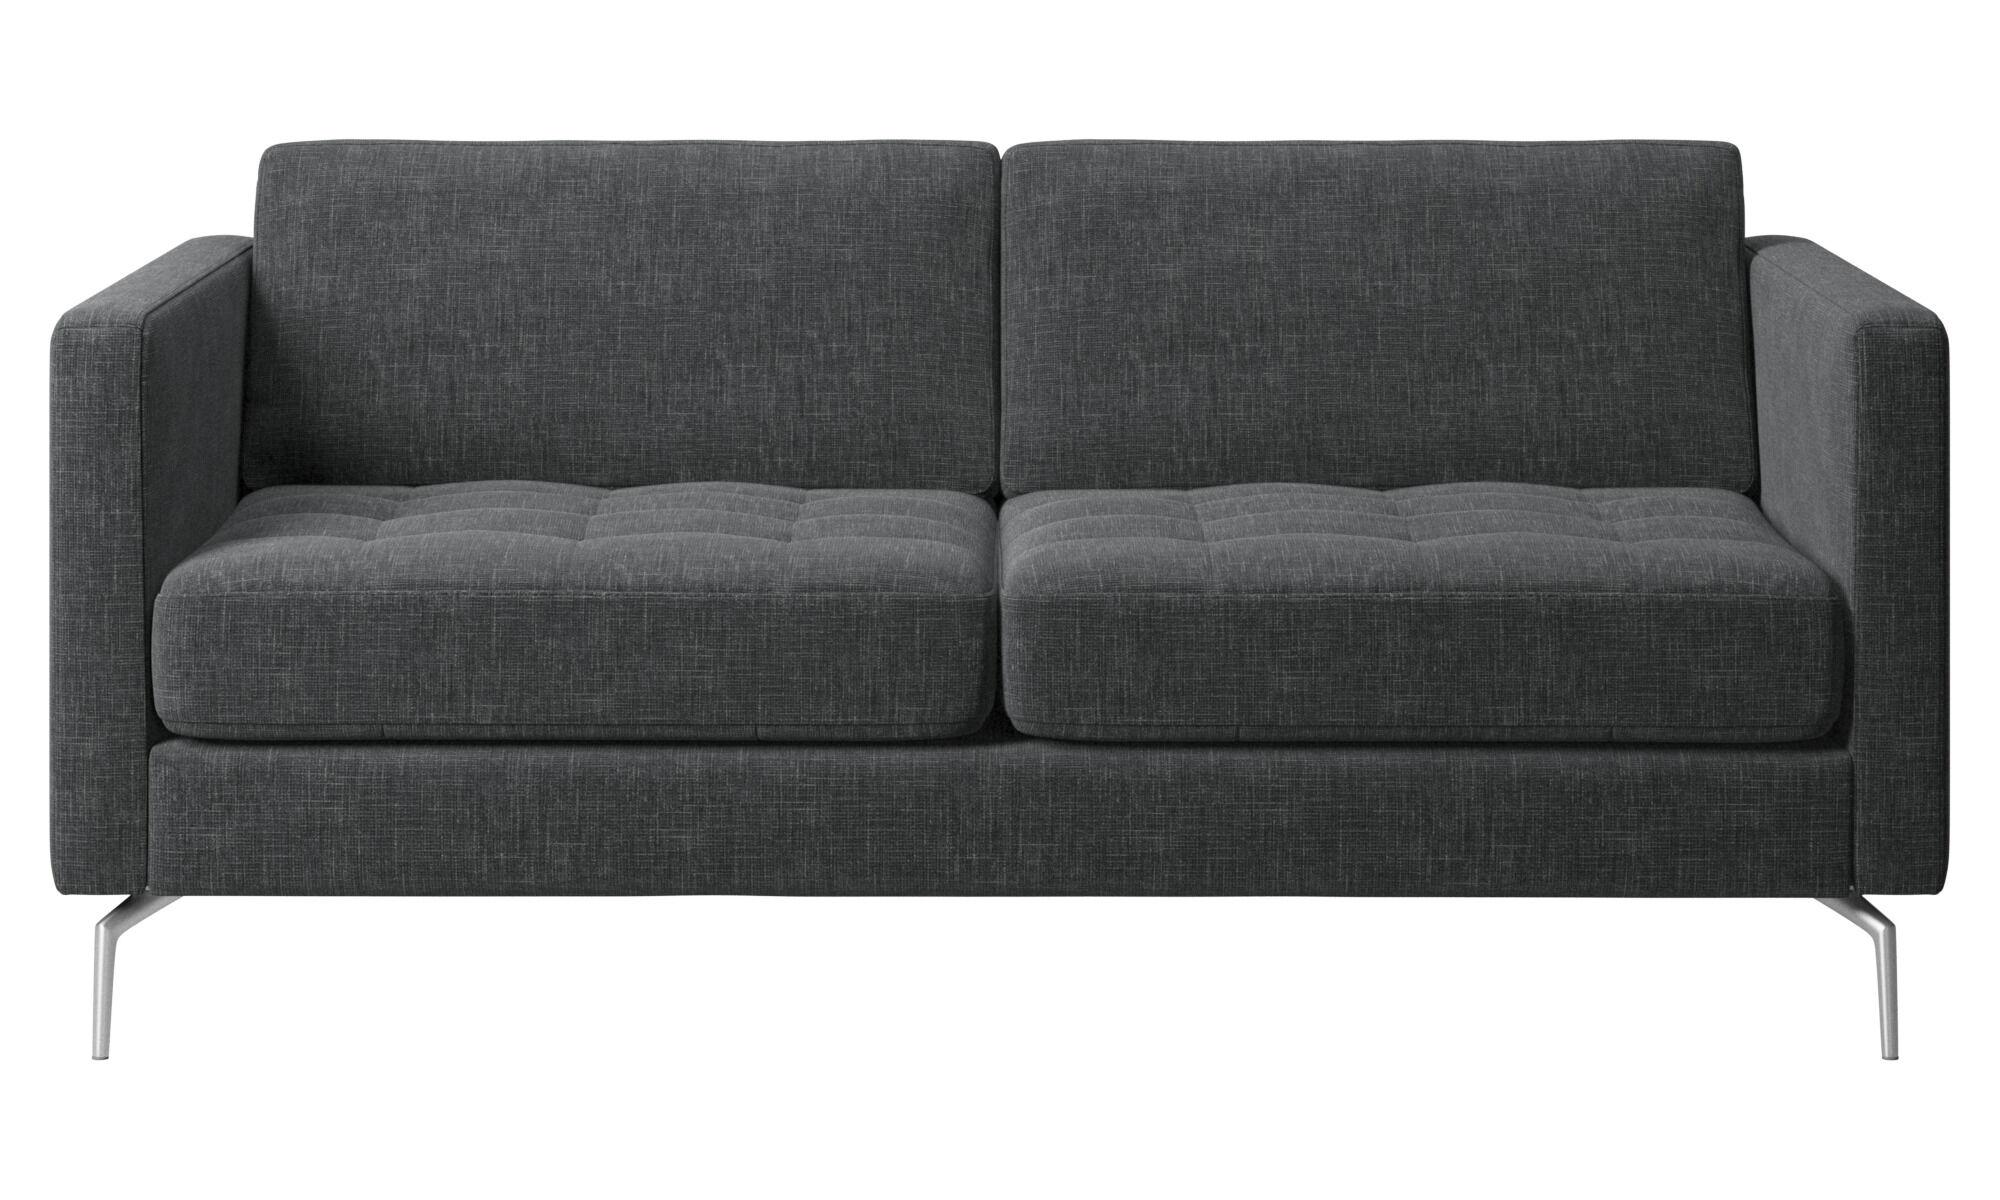 2 Seater Sofas   Osaka Sofa, Tufted Seat   Gray   Fabric